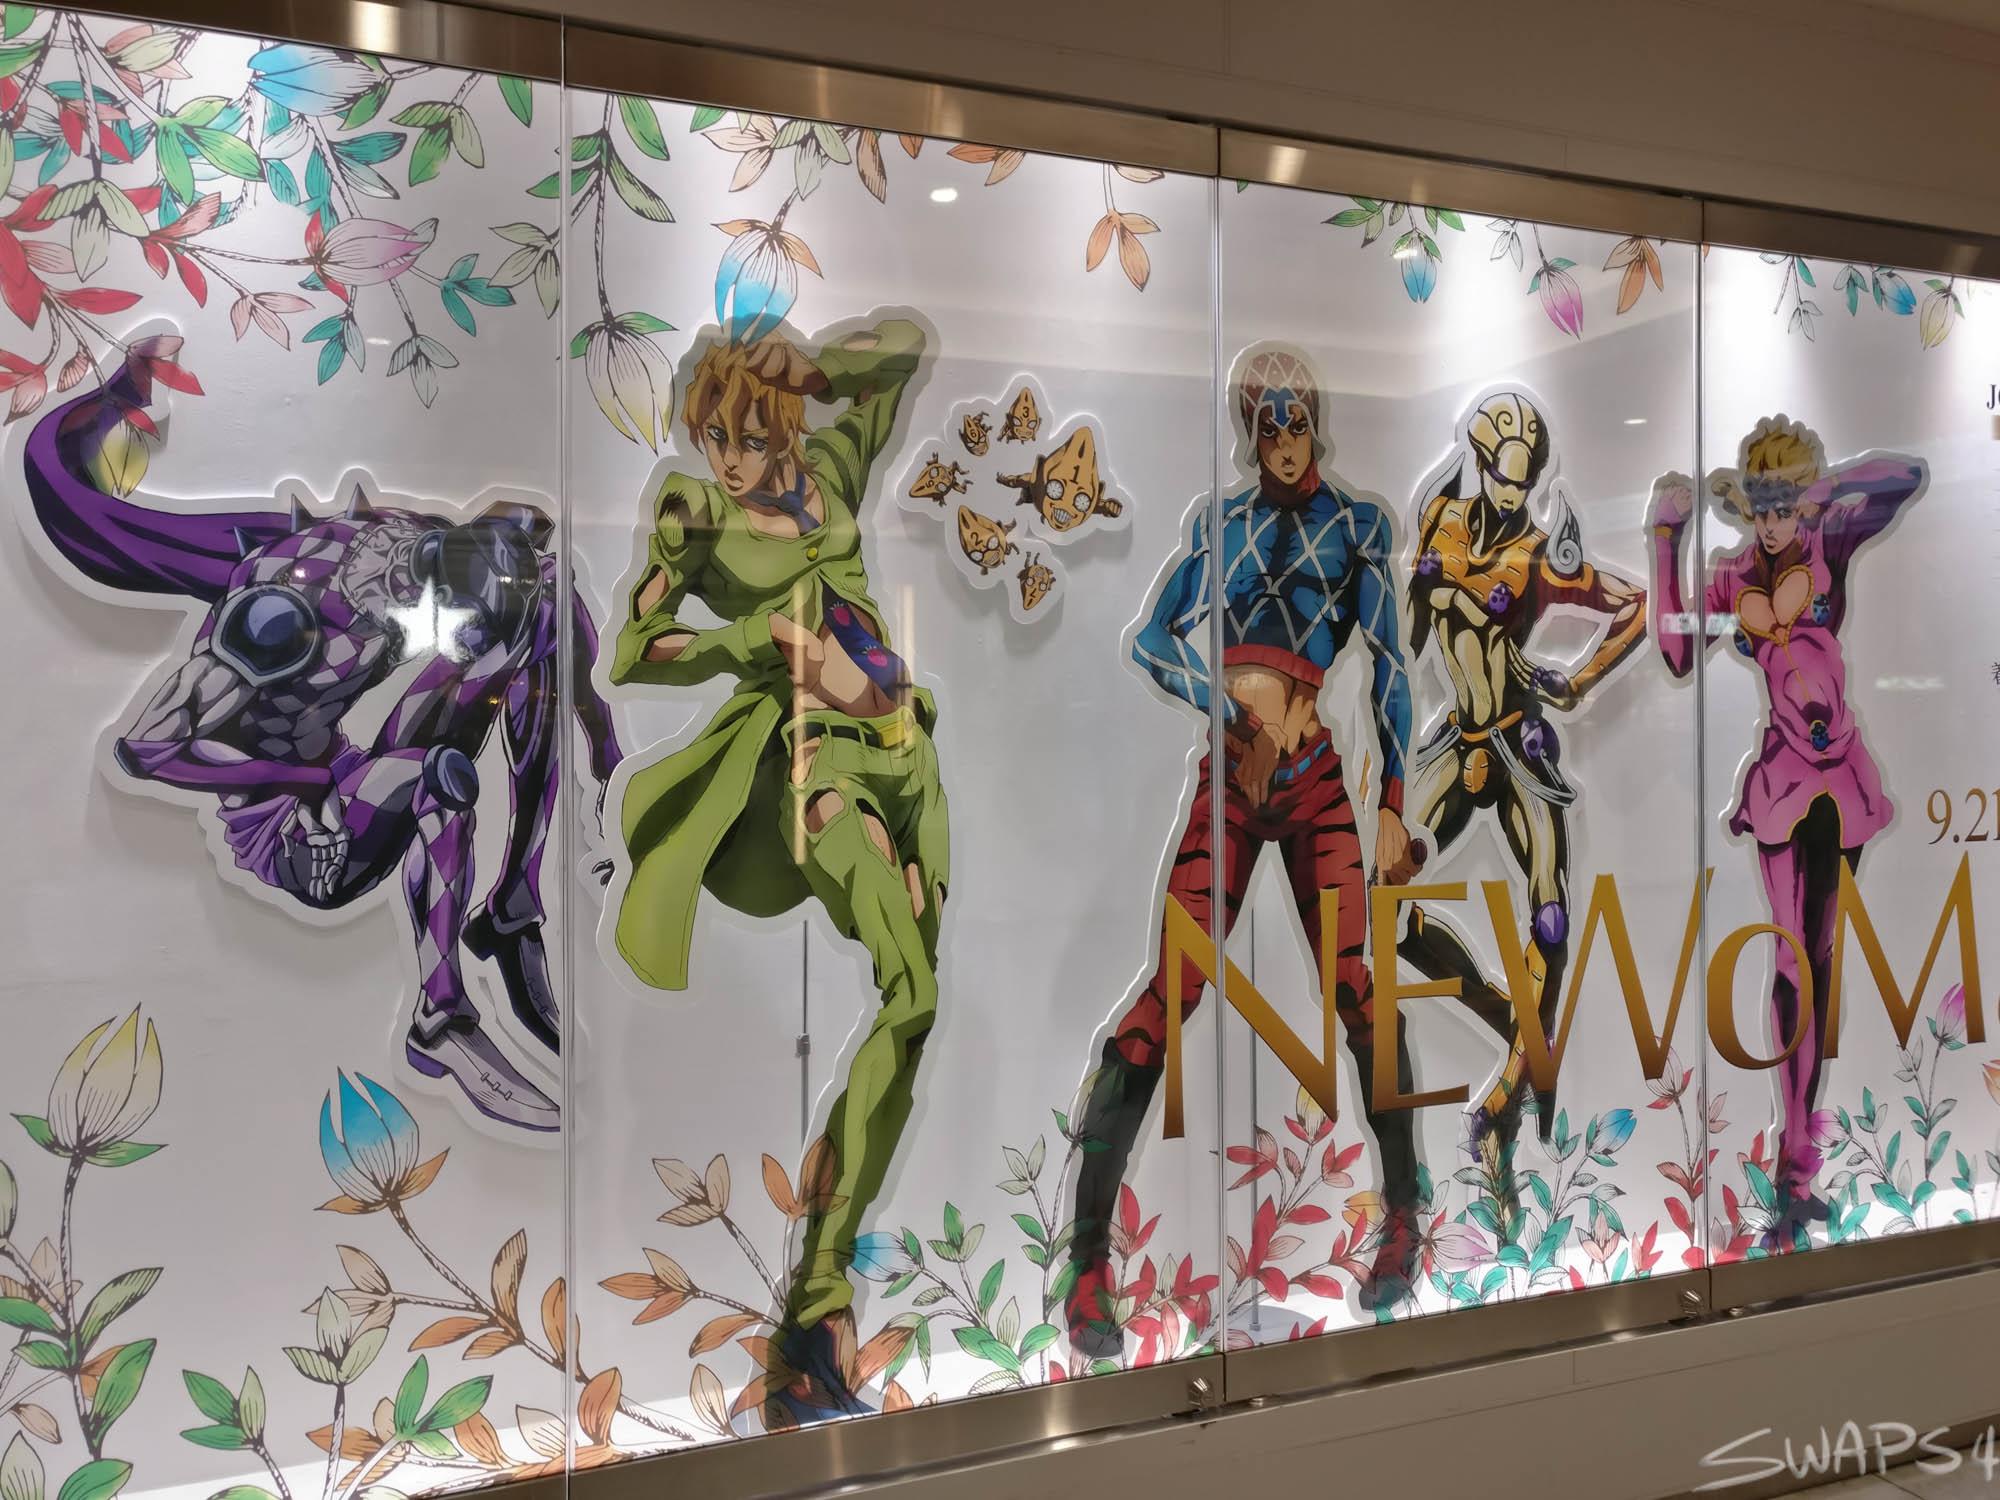 JoJo's Bizarre Adventure Golden Wind x NEWoMan in Shinjuku